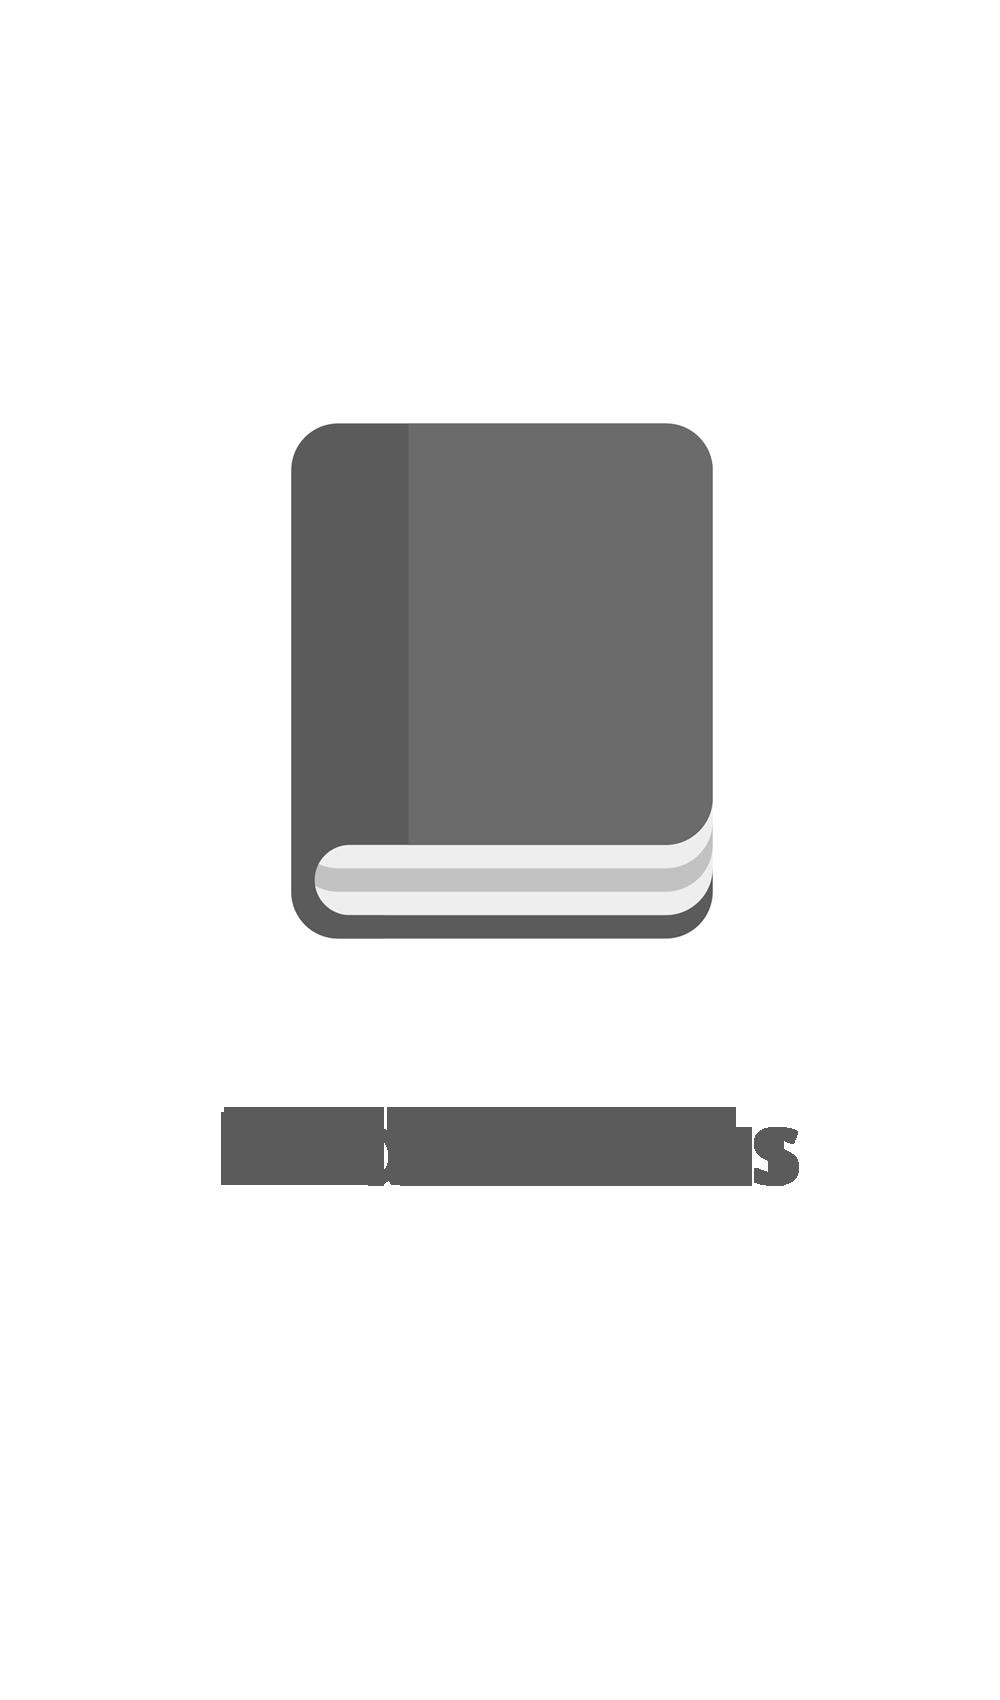 Estetisk rensning : bildstrider i 2000-talets Sverige